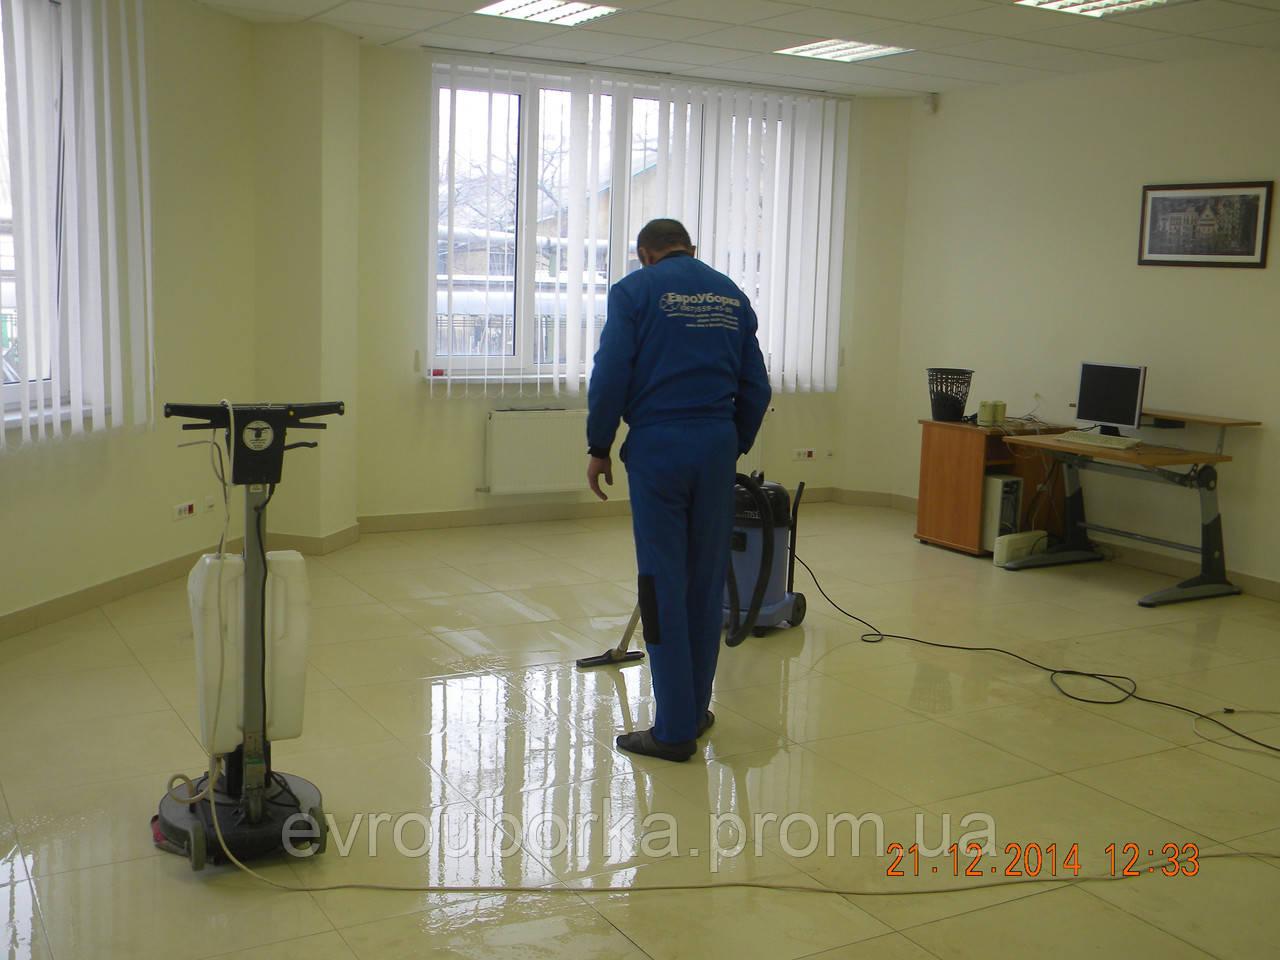 "Кристаллизация мрамора в Одессе и области от компании""ЕВРОУБОРКА"""